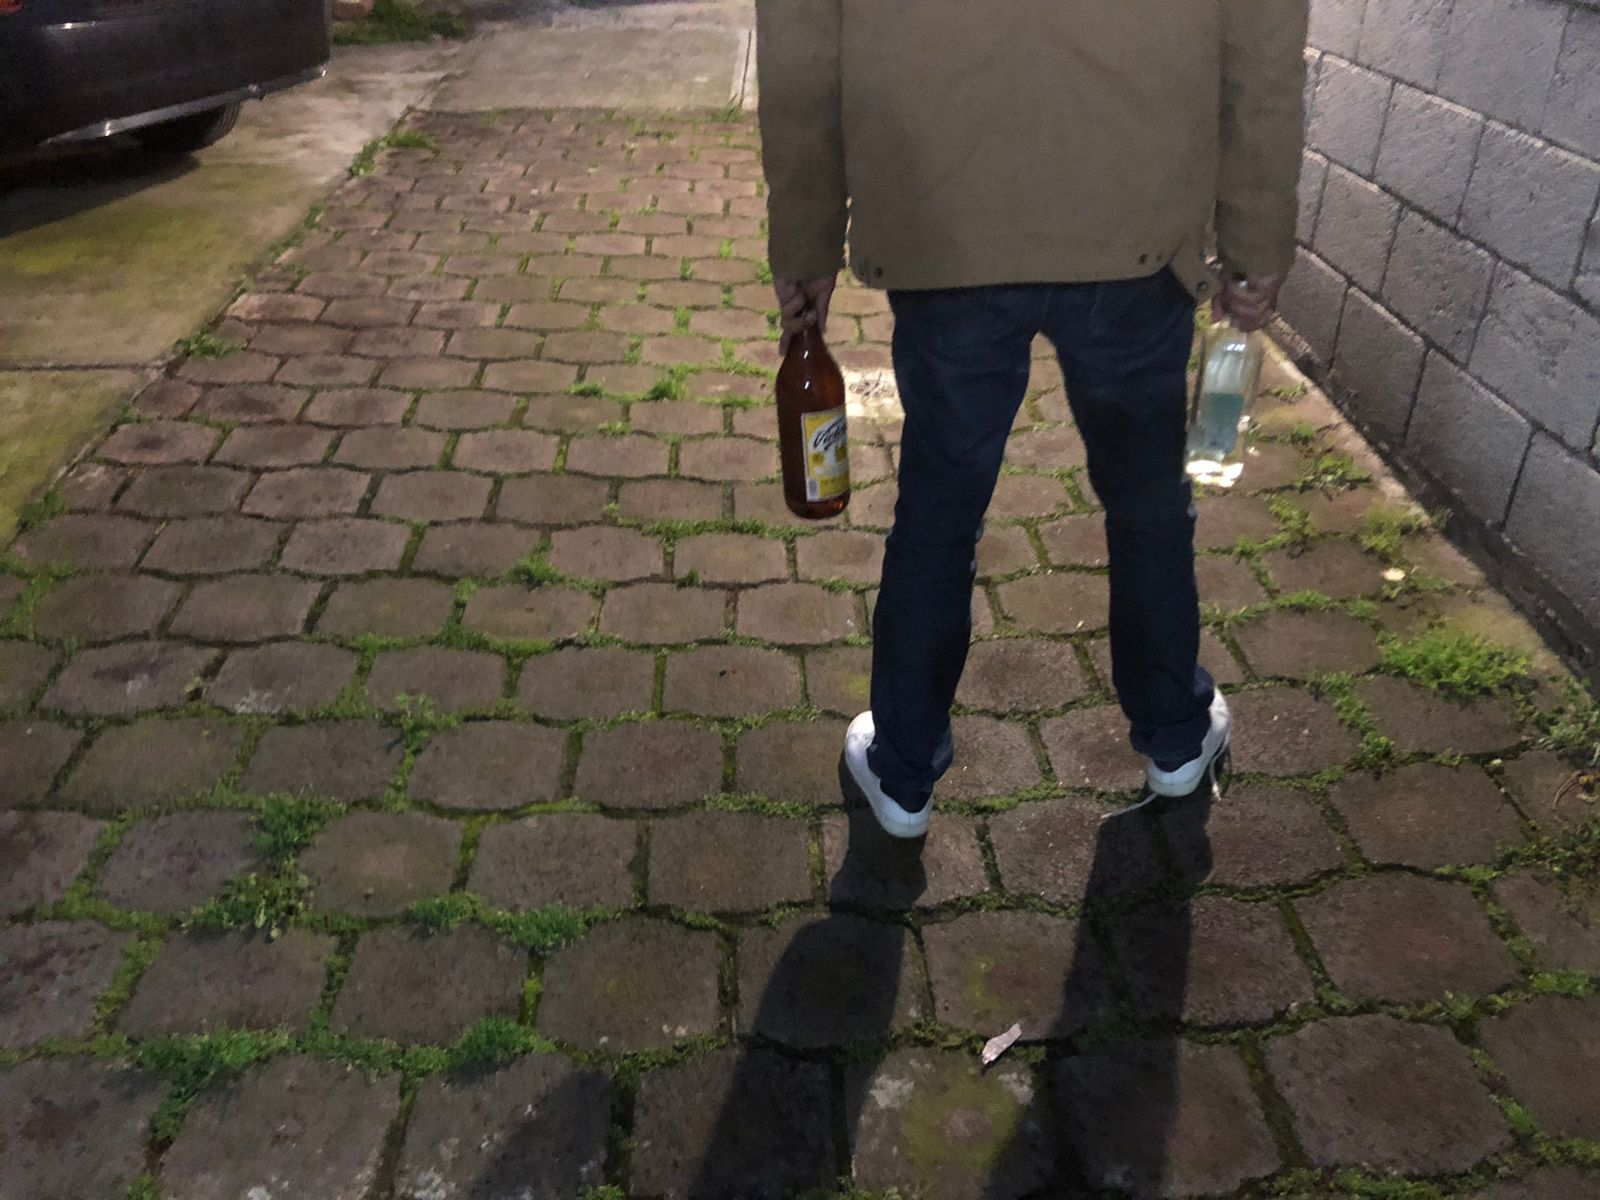 ENDURECEN PENAS POR VENDER O INDUCIR CONSUMO DE ALCOHOL EN MENORES